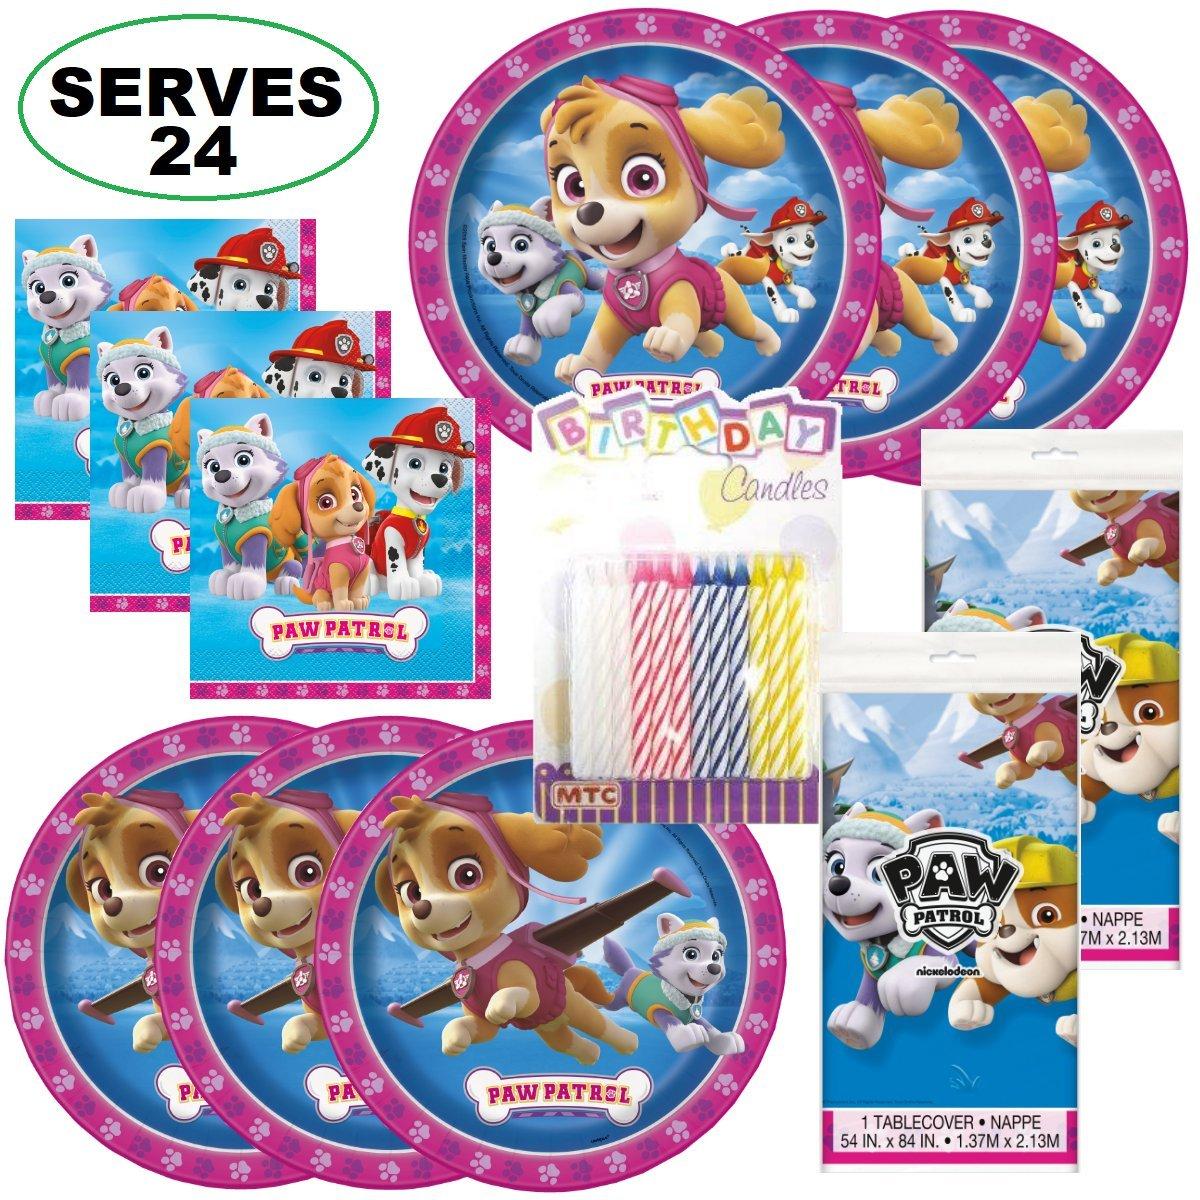 Paw Patrol Girl Super Bundle Party Supplies, Serves 24 Guests